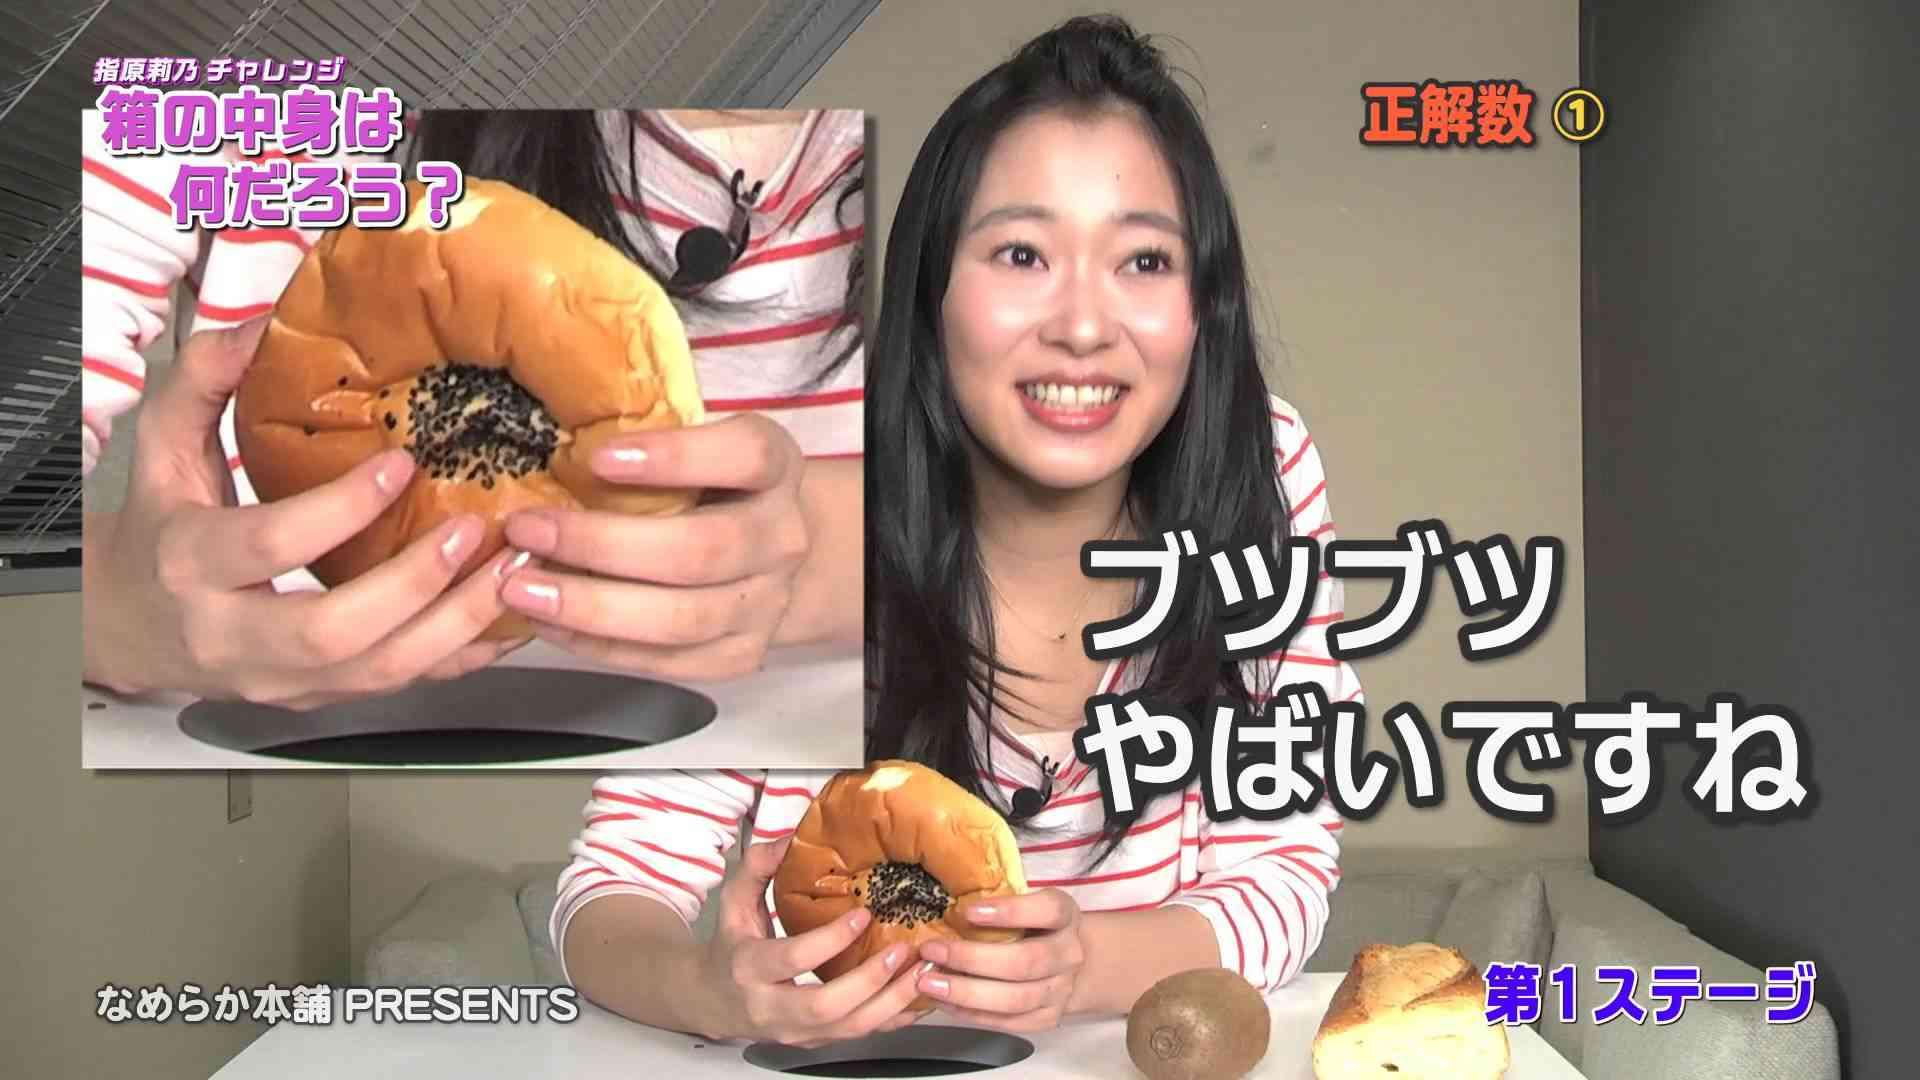 HKT48指原莉乃、髪バッサリ! 6年ぶりの短さにファンも驚き